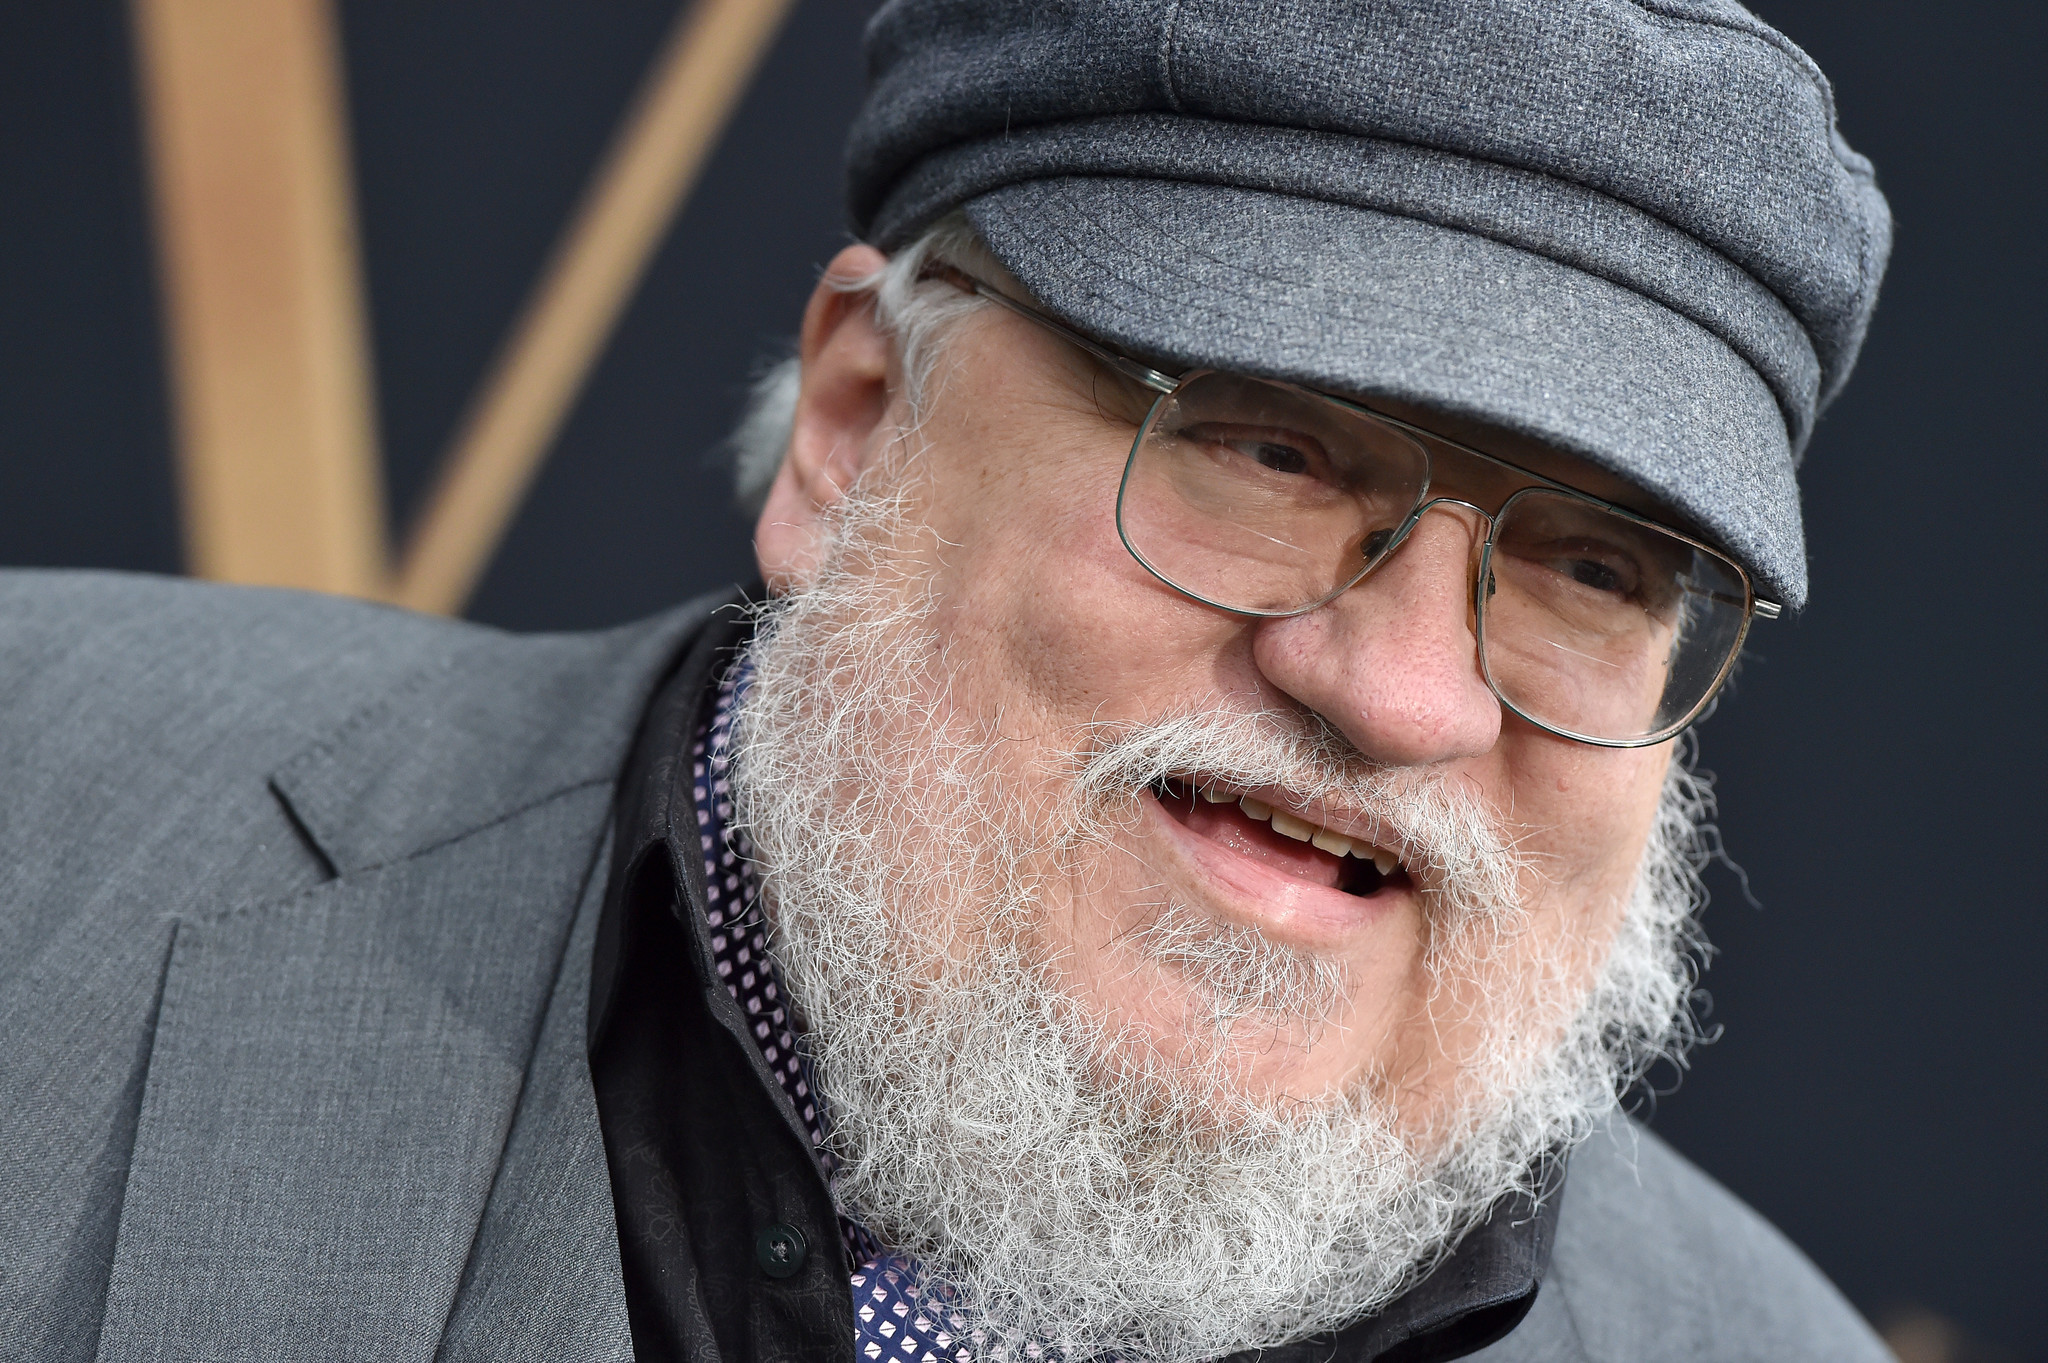 George R.R. Martin writing next 'Game of Thrones' book while quarantining amid coronavirus